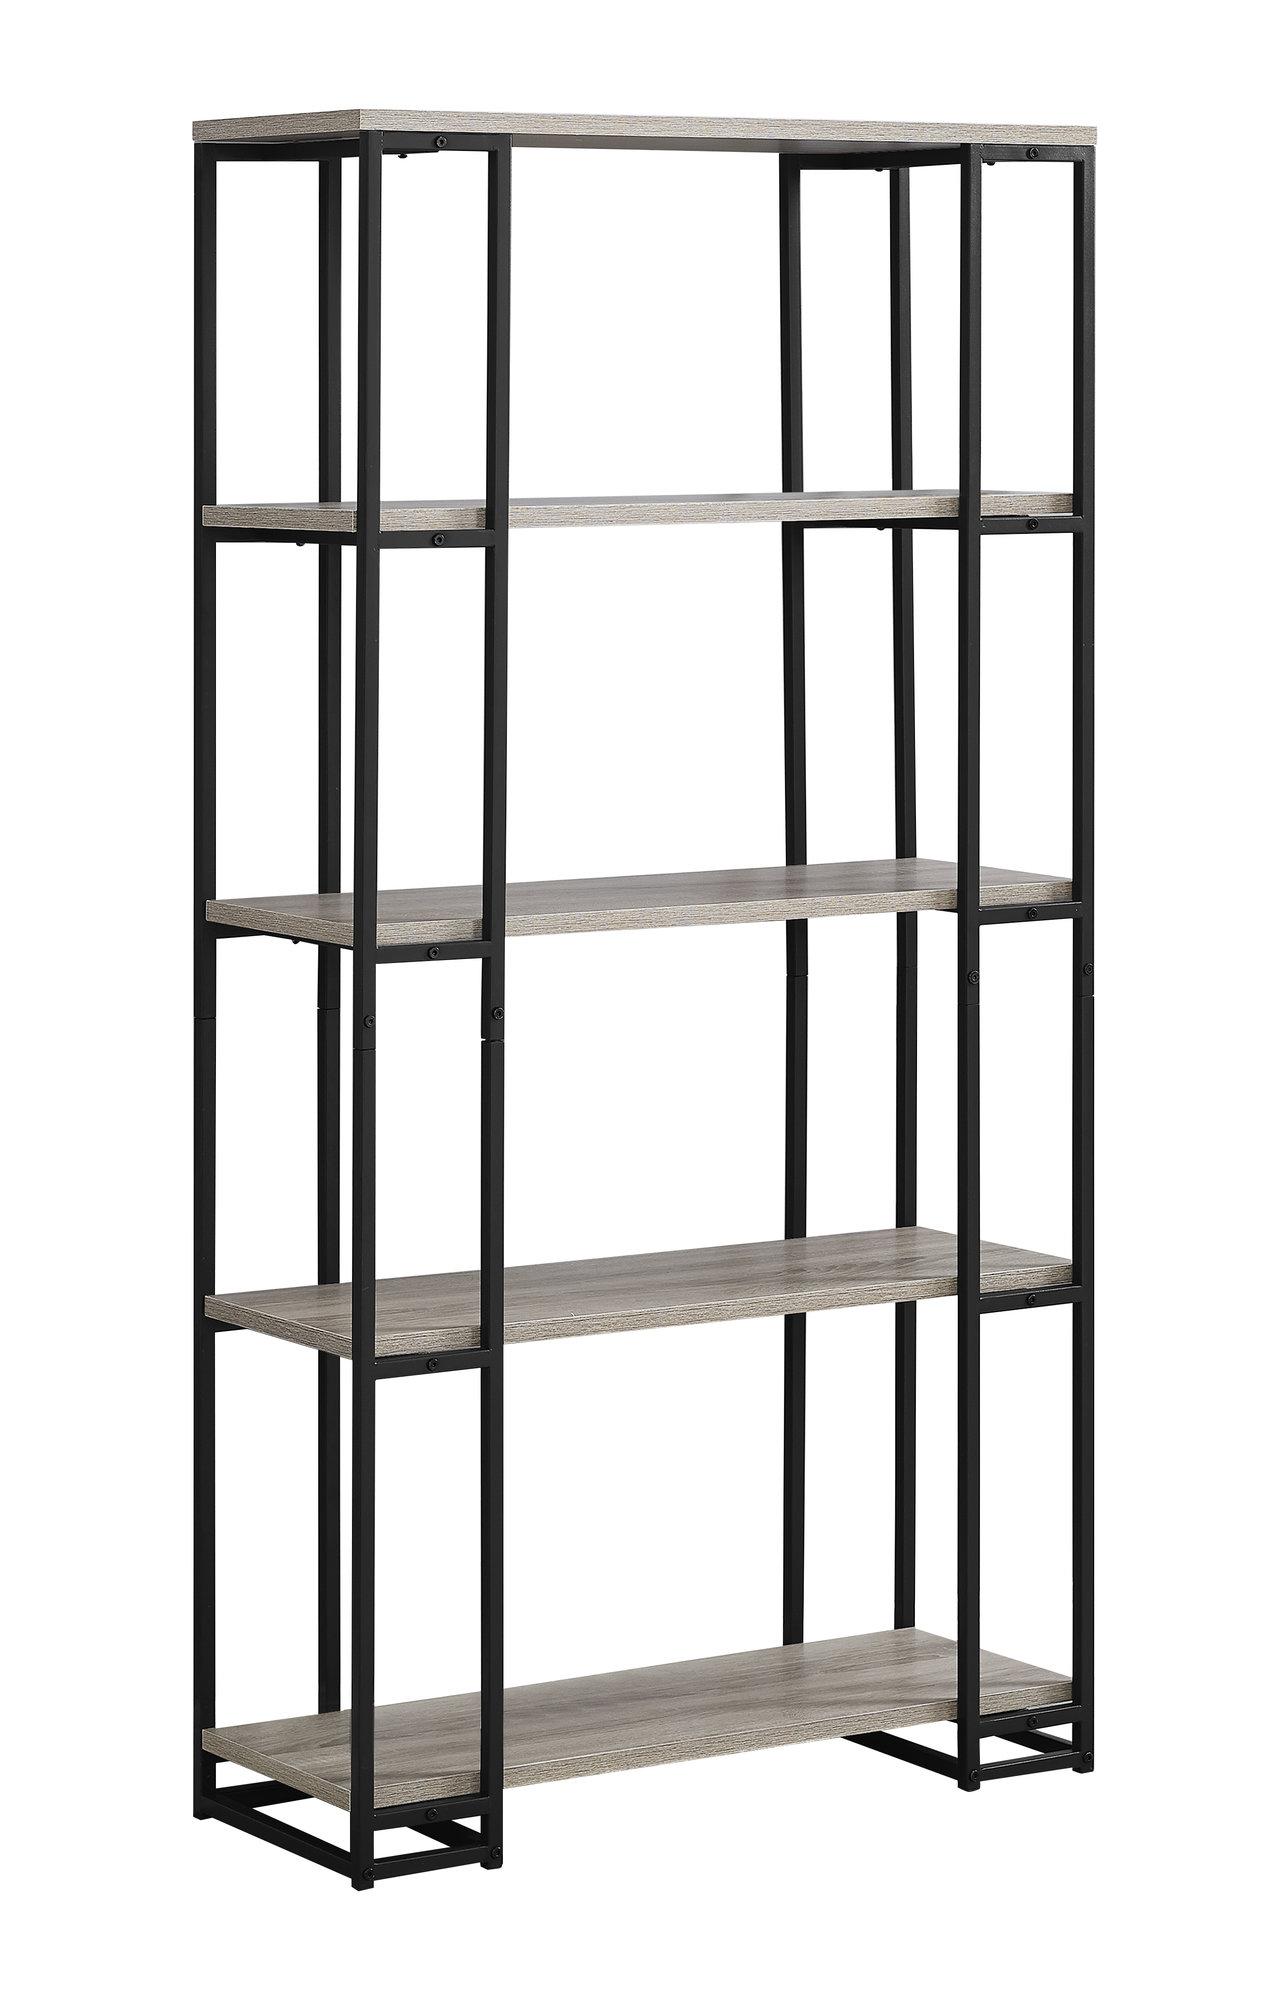 "12.5"" x 32"" x 62"" Dark Taupe Black Mdf Metal  Bookcase"